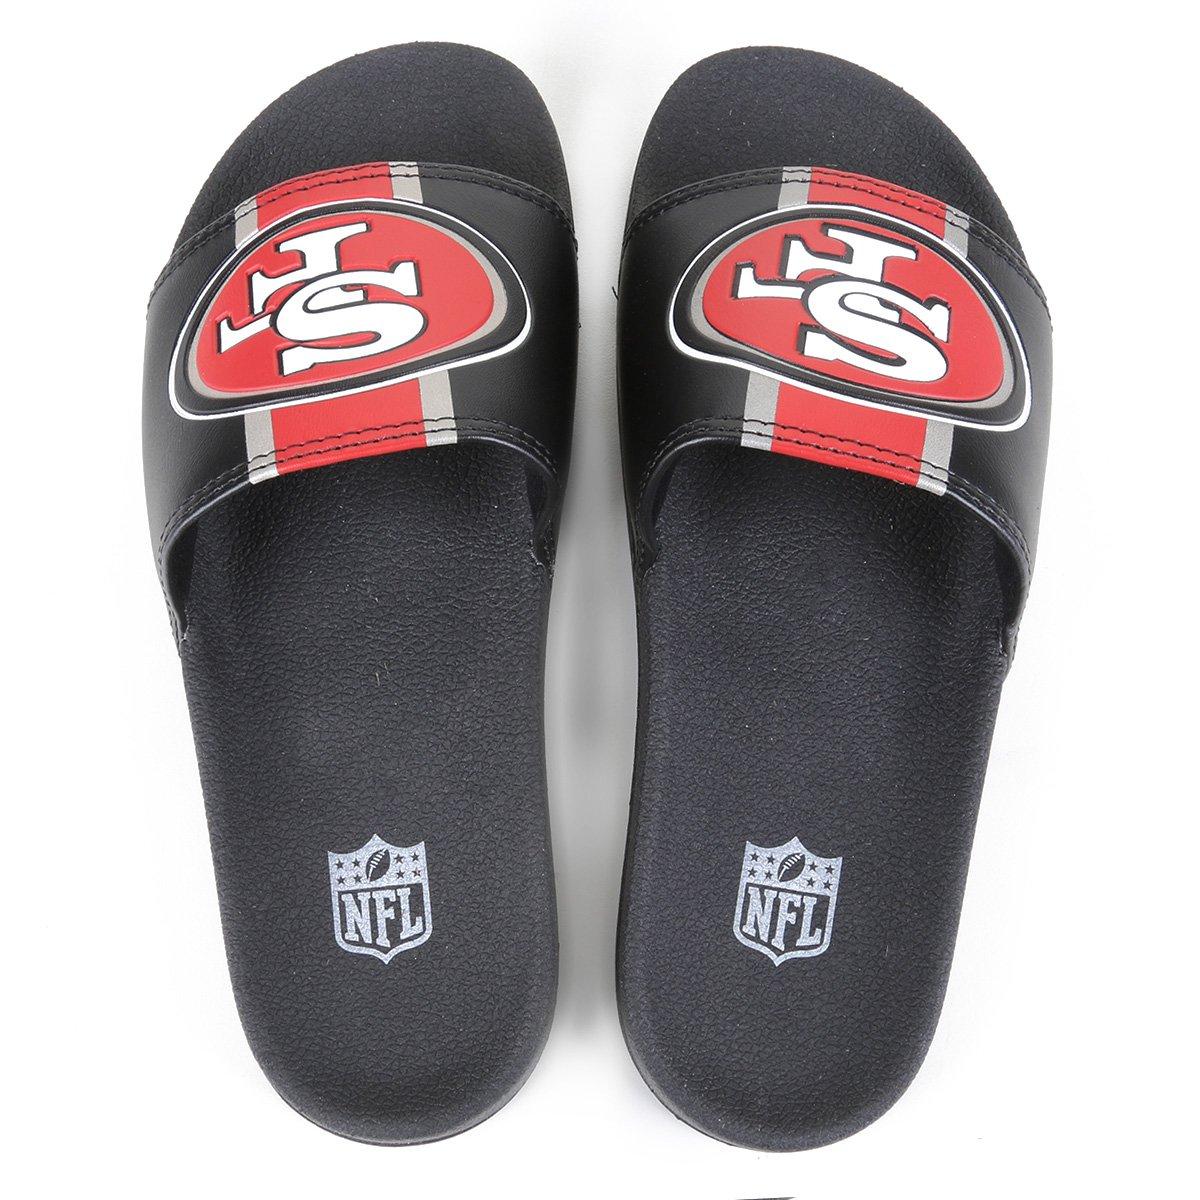 Chinelo NFL San Francisco 49ers New Era Slide Masculino